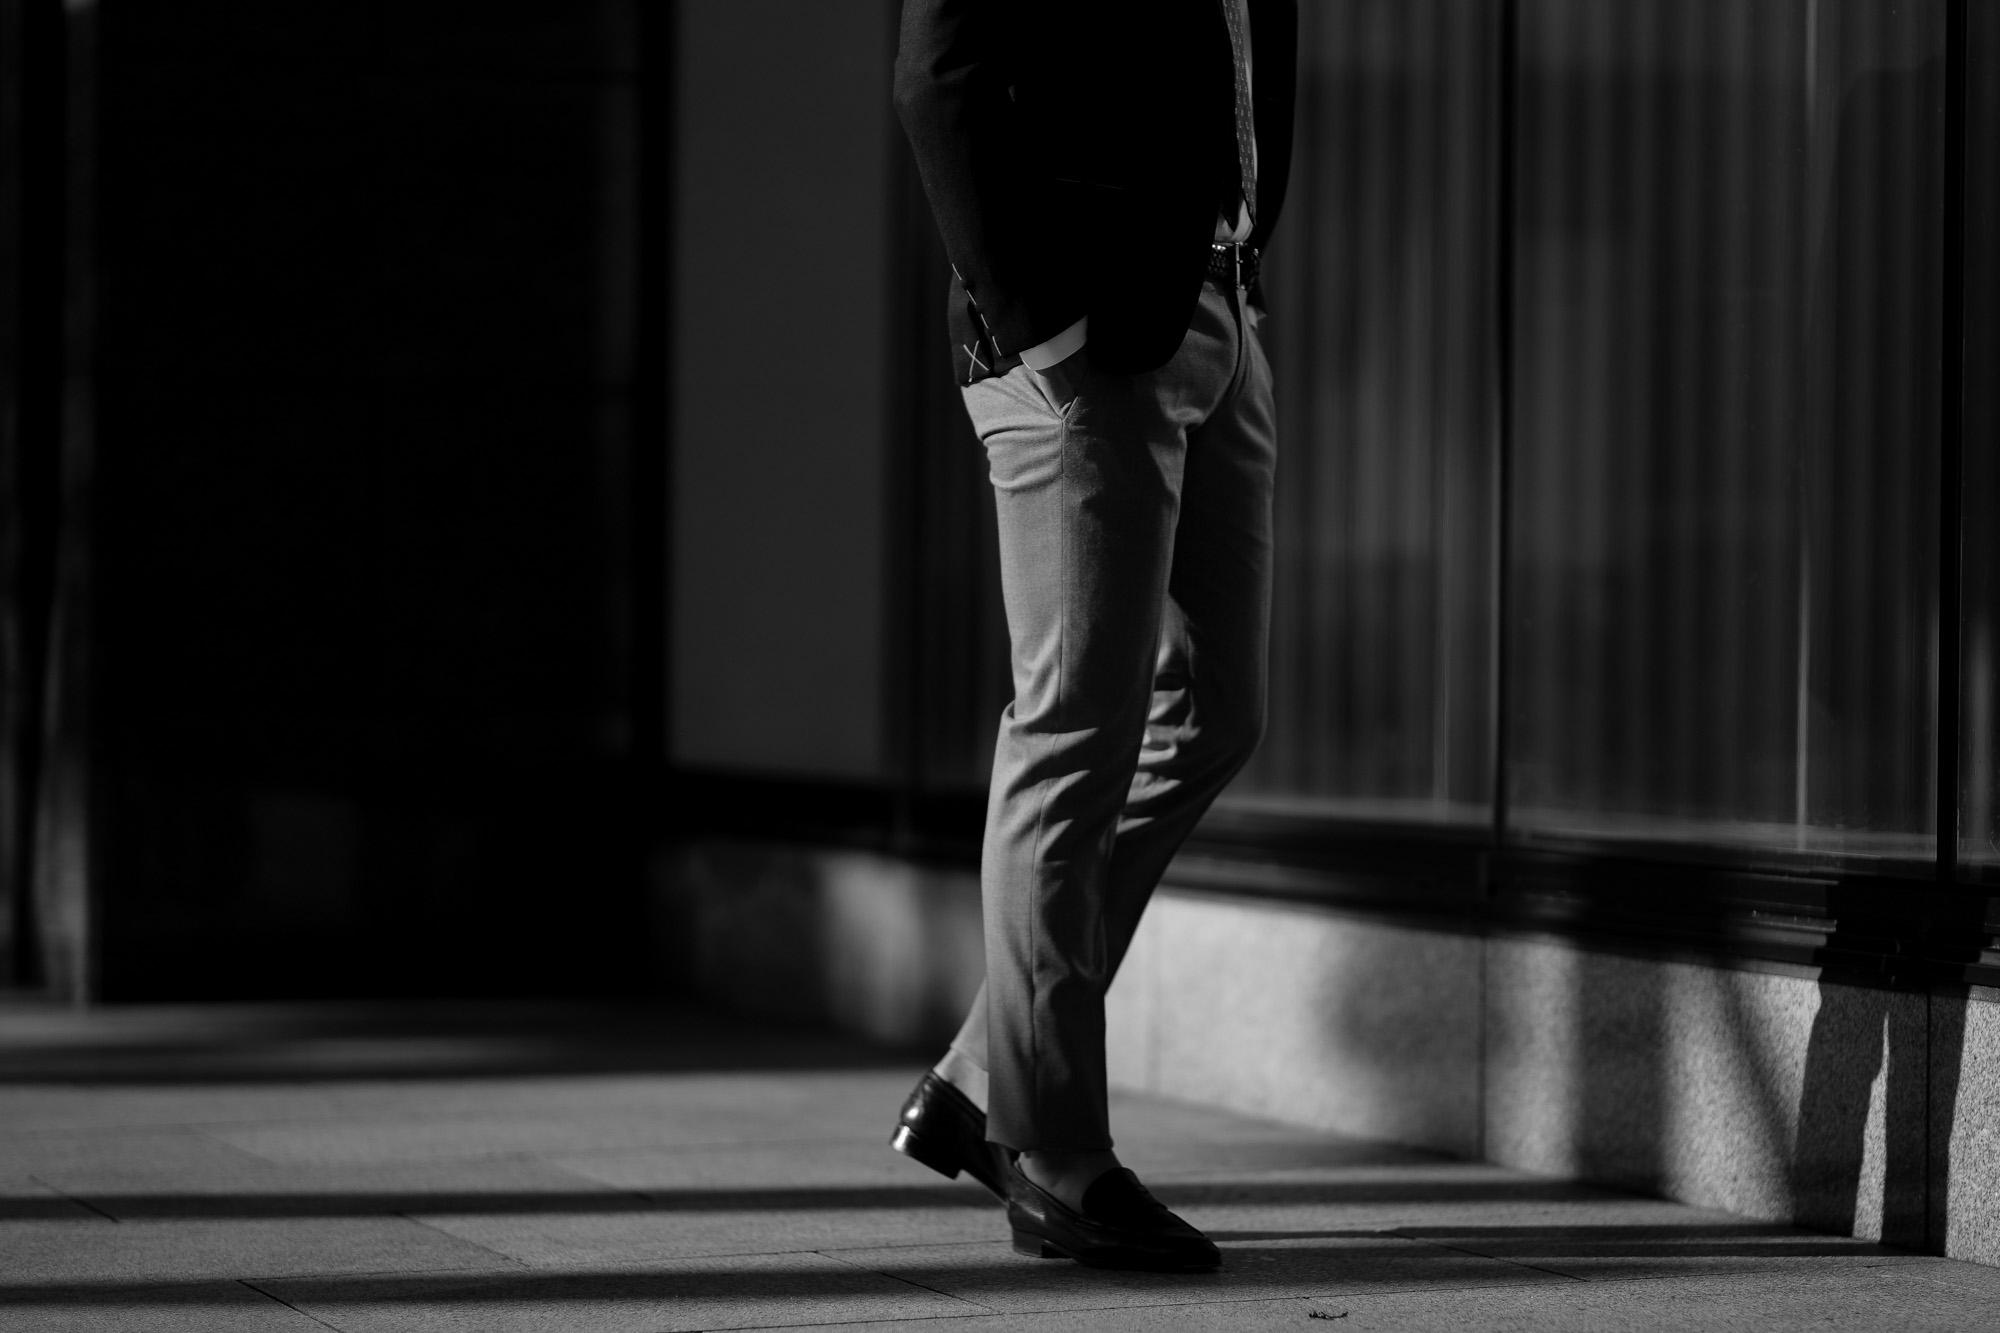 PT TORINO(ピーティートリノ) TRAVELLER (トラベラー) SUPER SLIM FIT (スーパースリムフィット) Stretch Techno Jersey ストレッチ テクノ ジャージ スラックス CHACOAL GRAY (チャコールグレー・0250) 2020 秋冬 【ご予約受付中】愛知 名古屋 altoediritto アルトエデリット